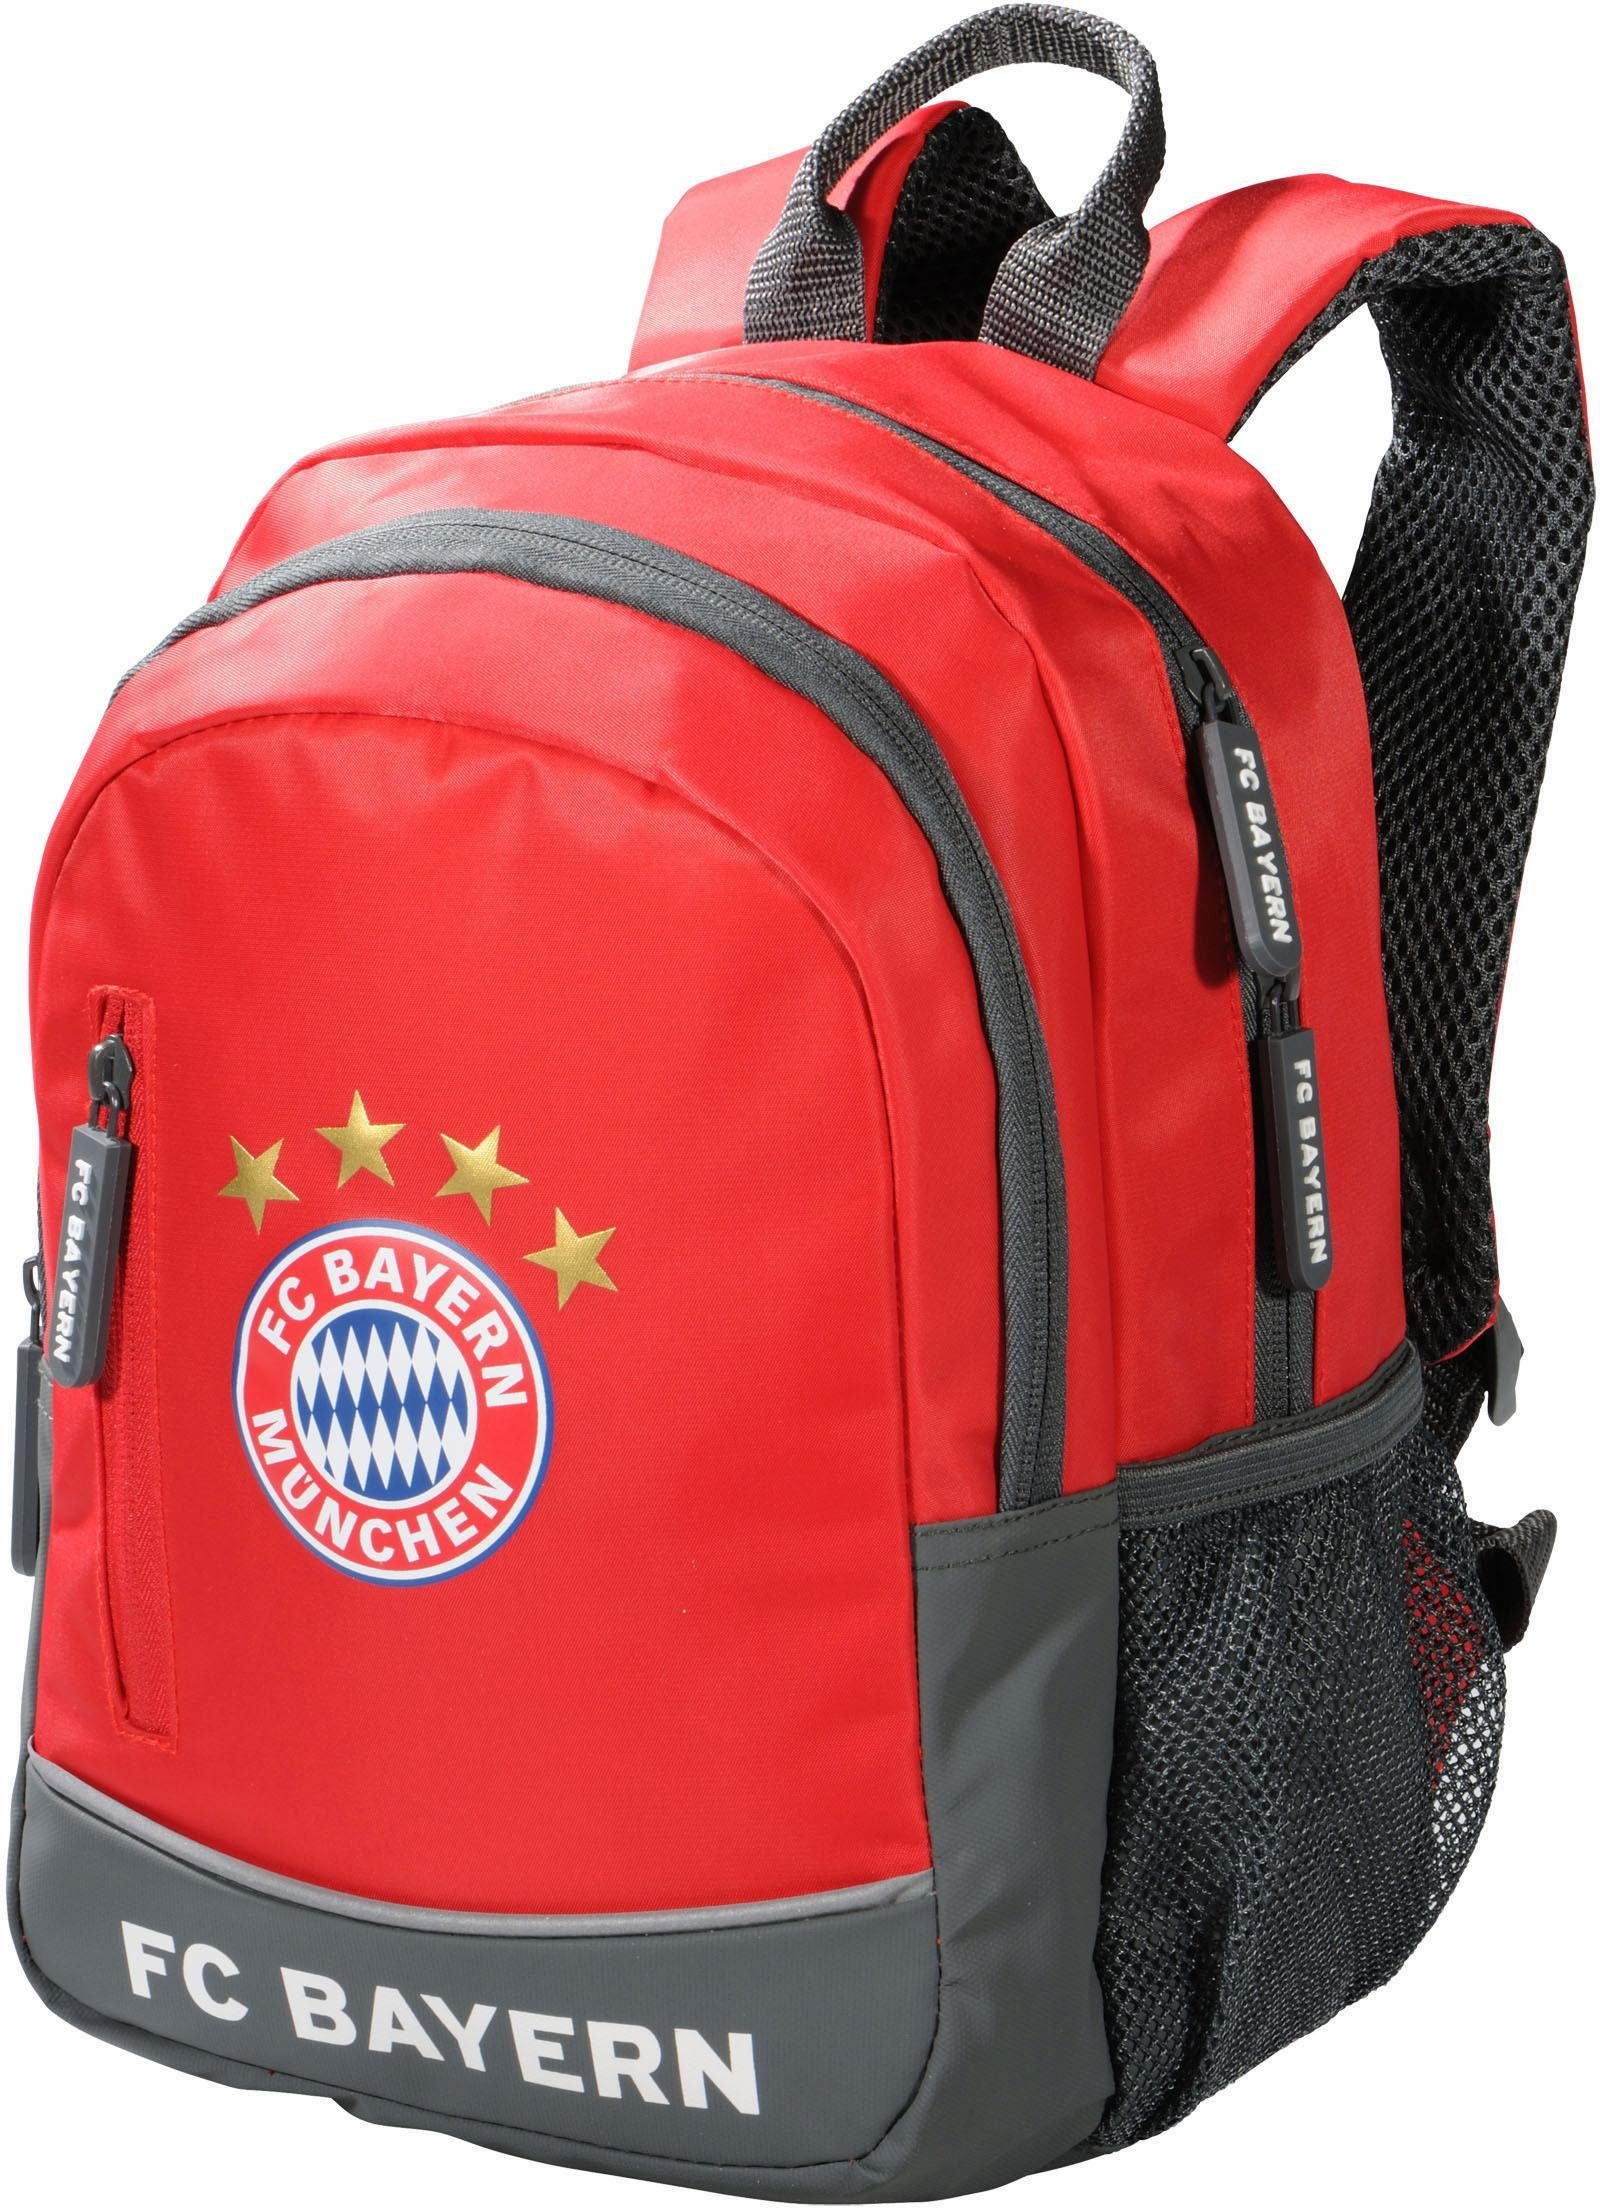 FC Bayern Kindergartenrucksack, Höhe 29 cm